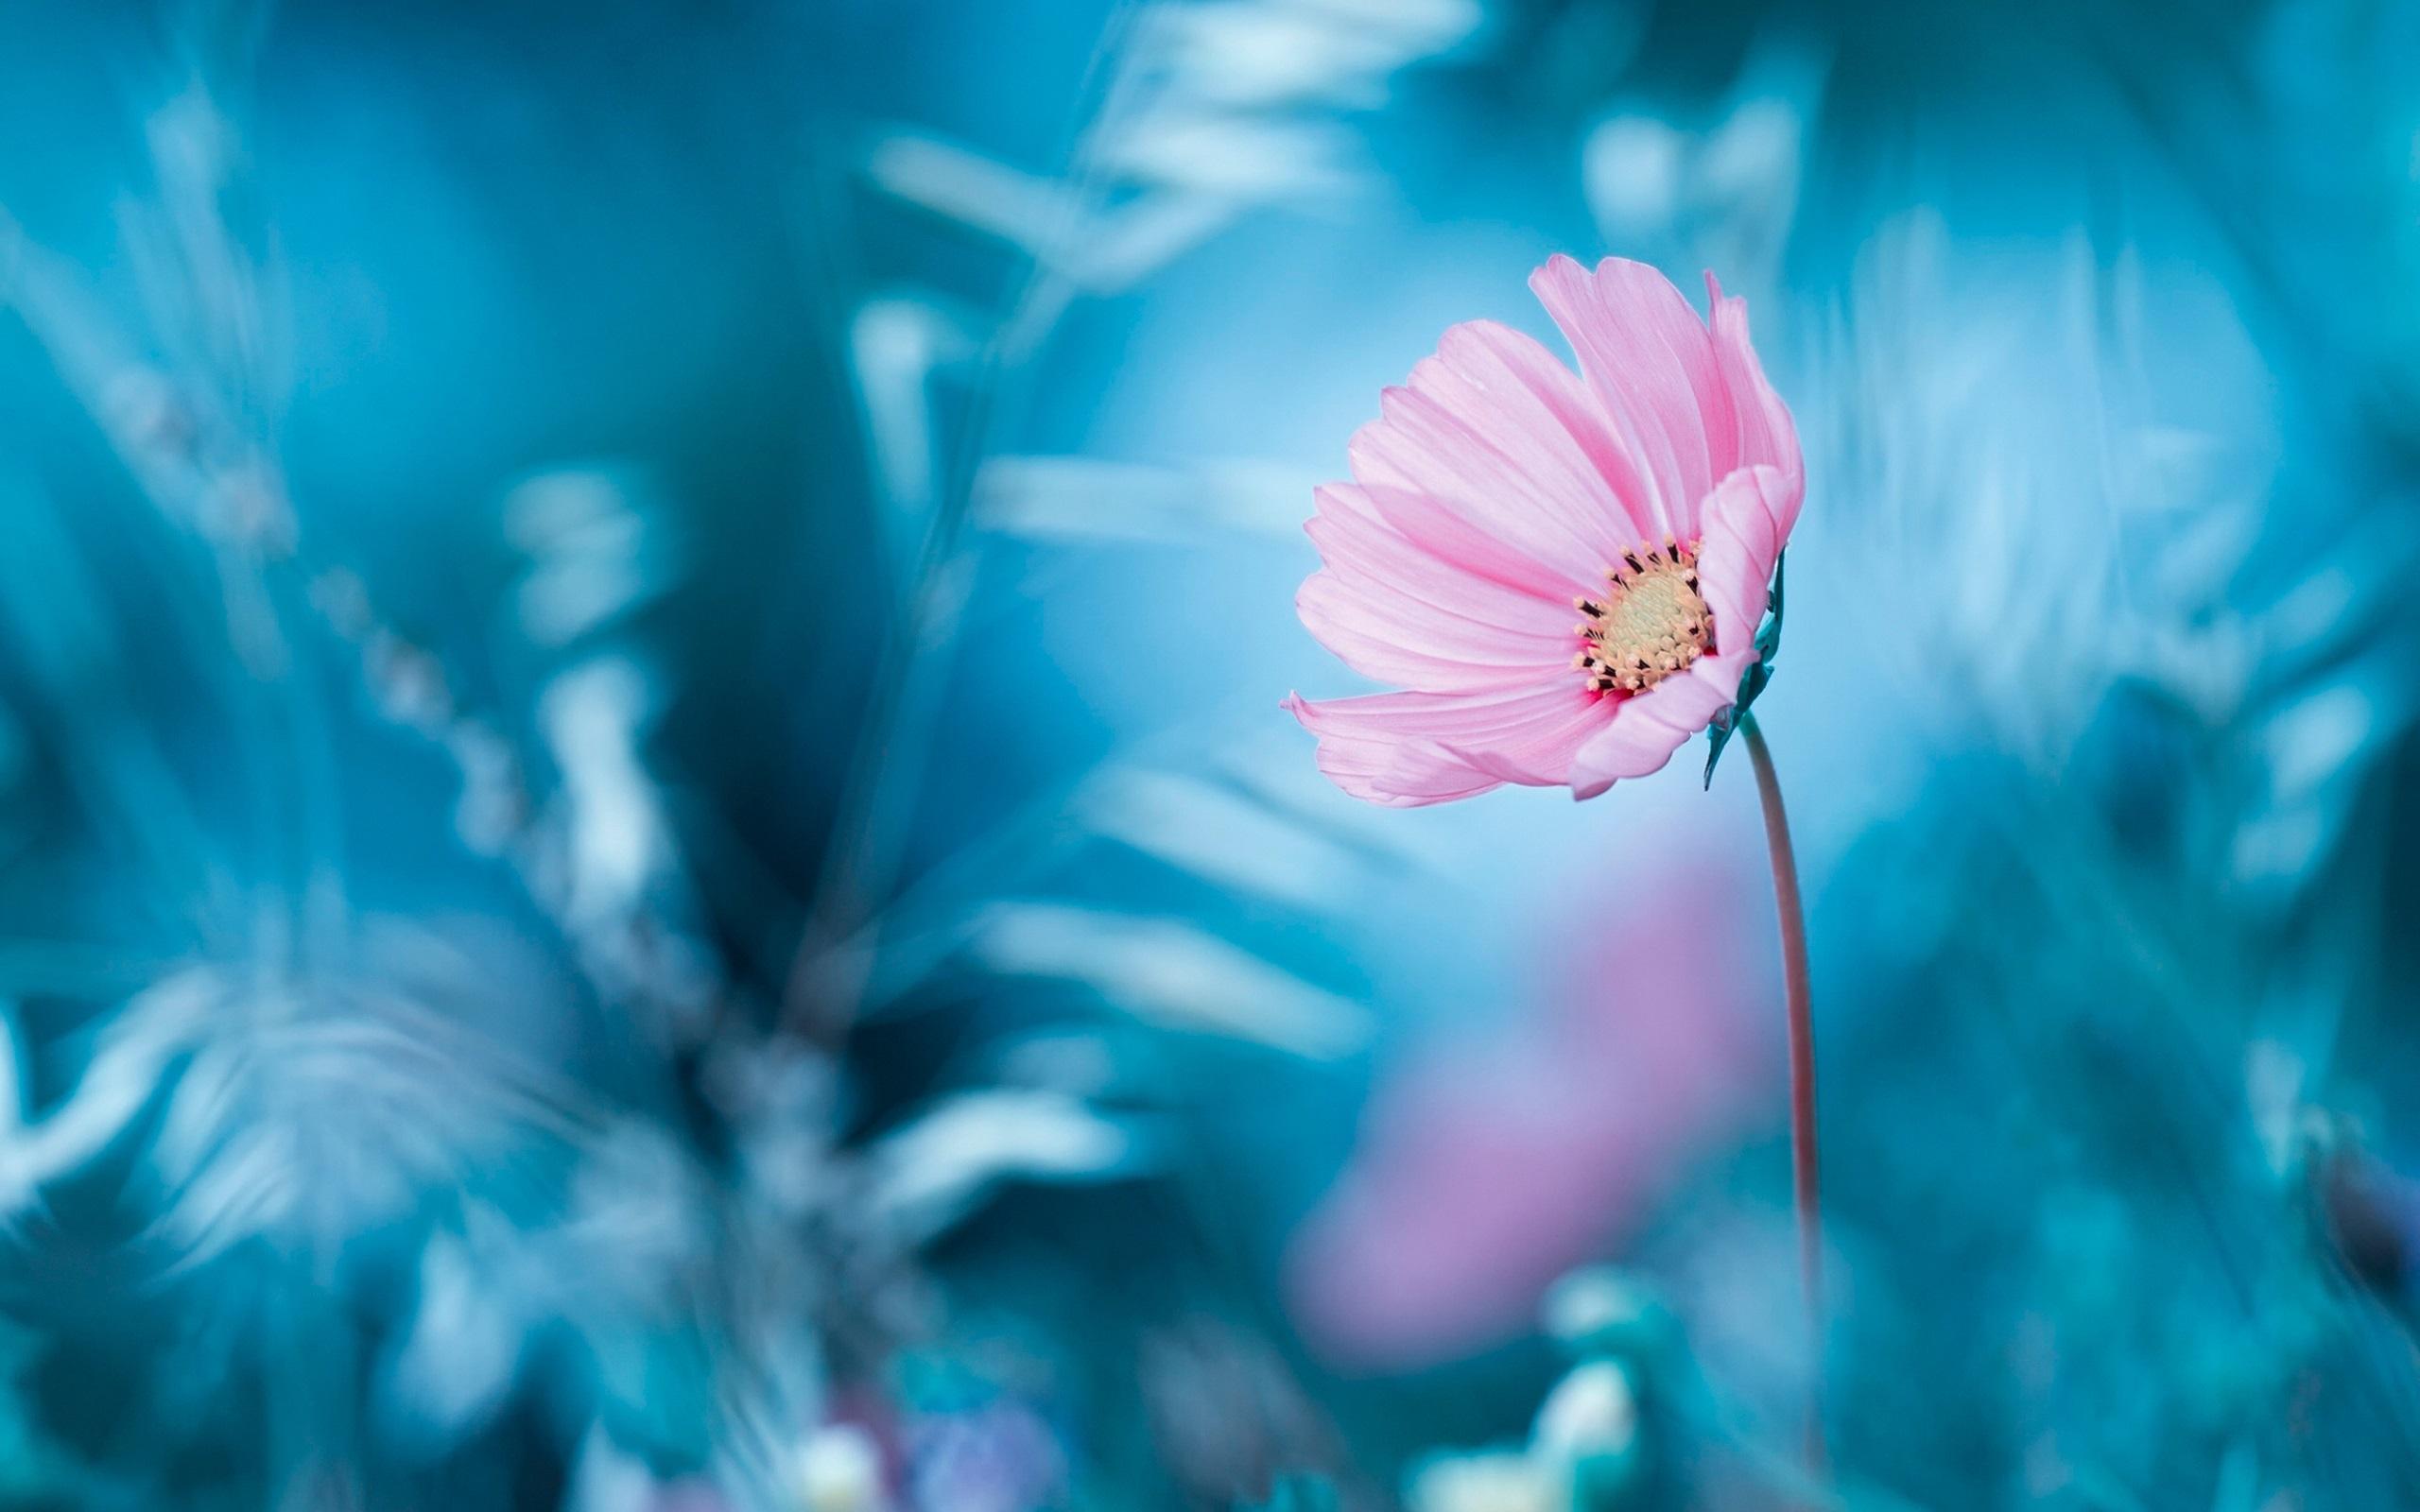 Wallpaper Pink Flower Blue Background Bokeh 2560x1600 Hd Picture